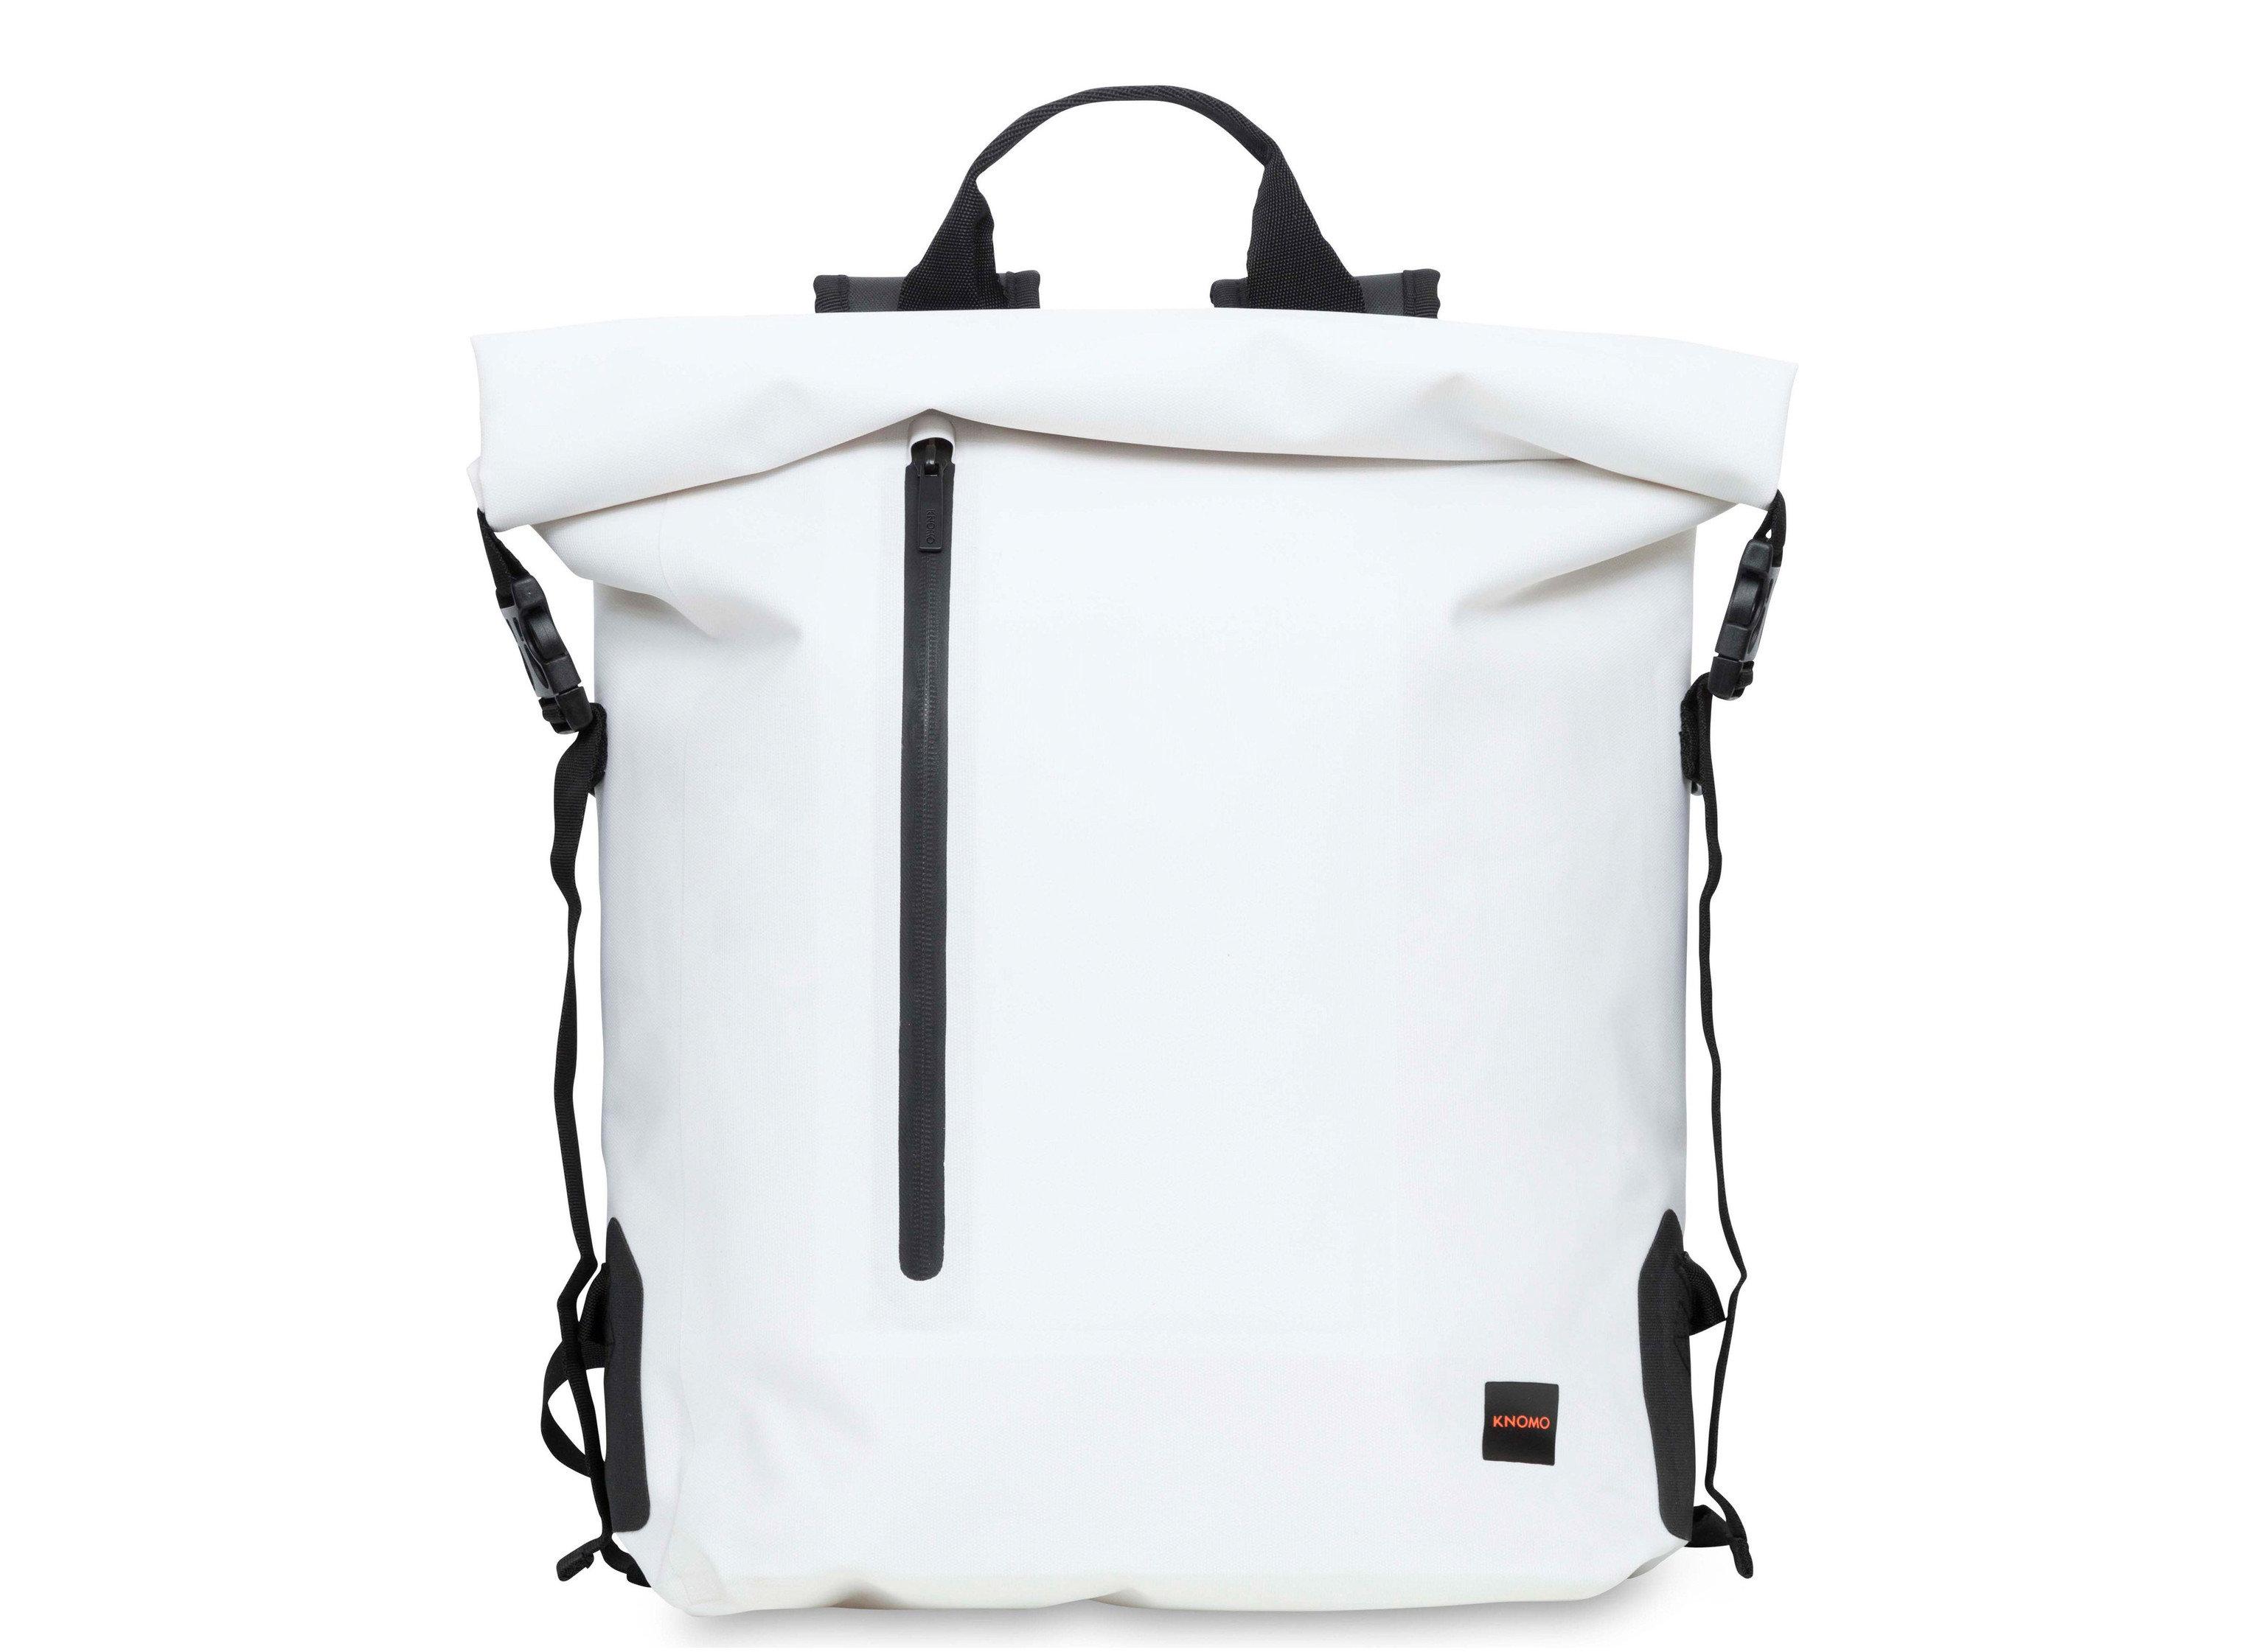 Style + Design white bag product product design shoulder bag kitchenware luggage & bags brand font pot